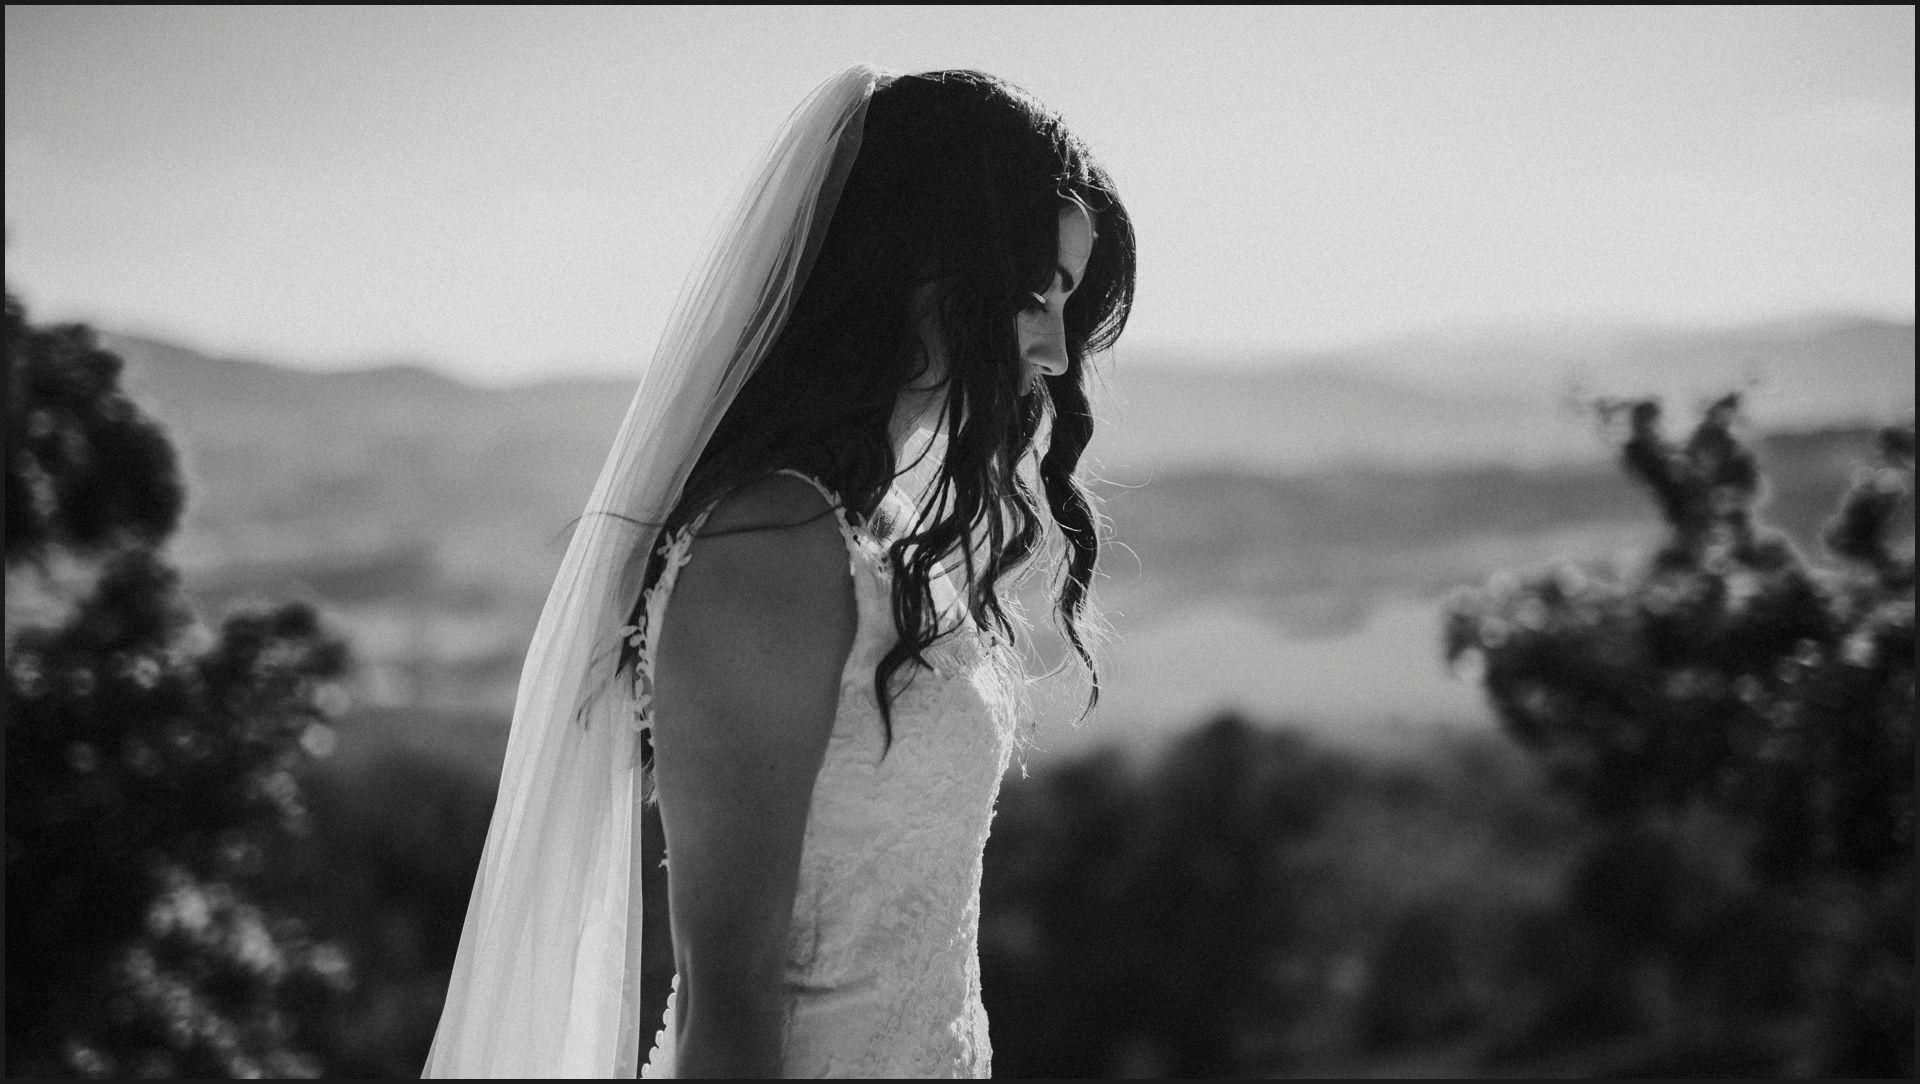 black and white, wedding, umbria, nikis resort, bride